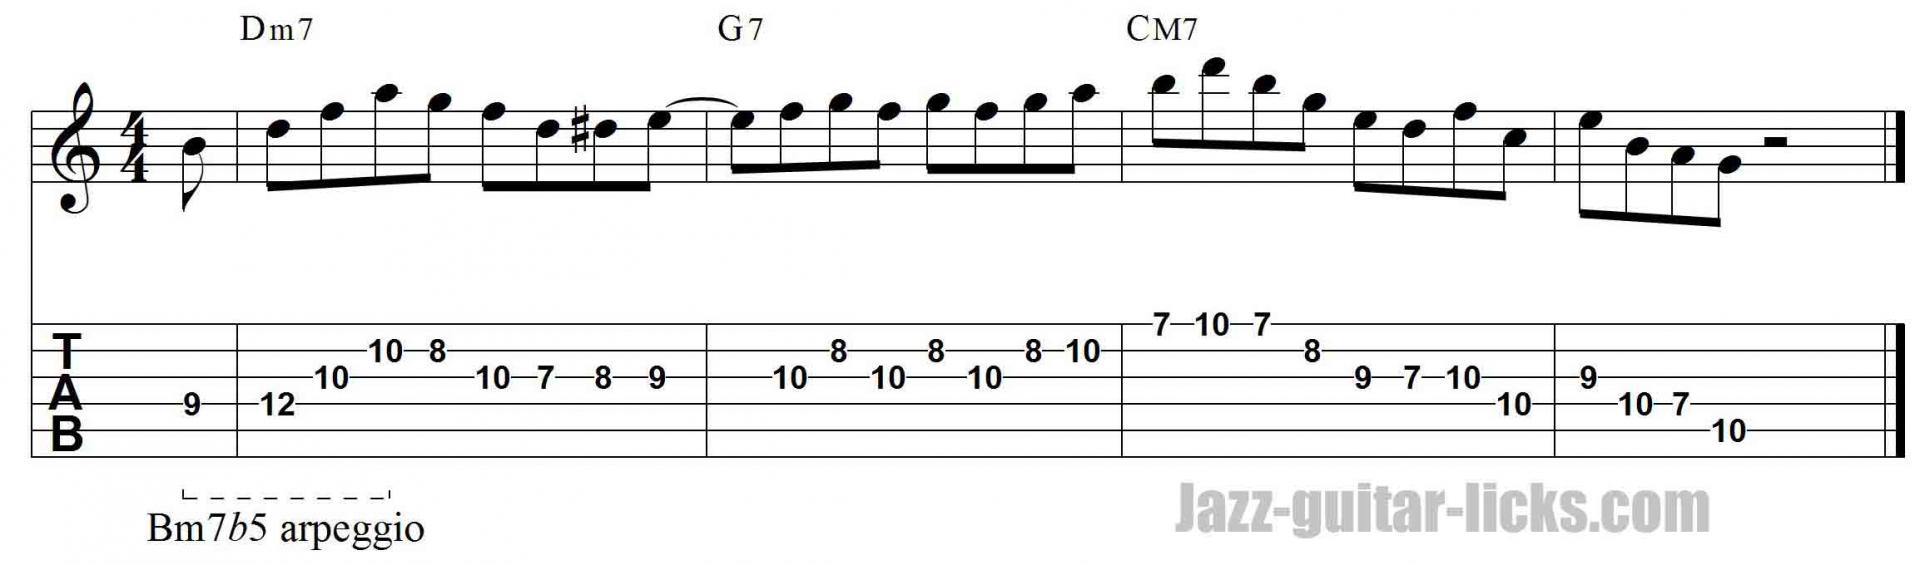 Bm7b5 arpeggio jazz guiatr lick 1